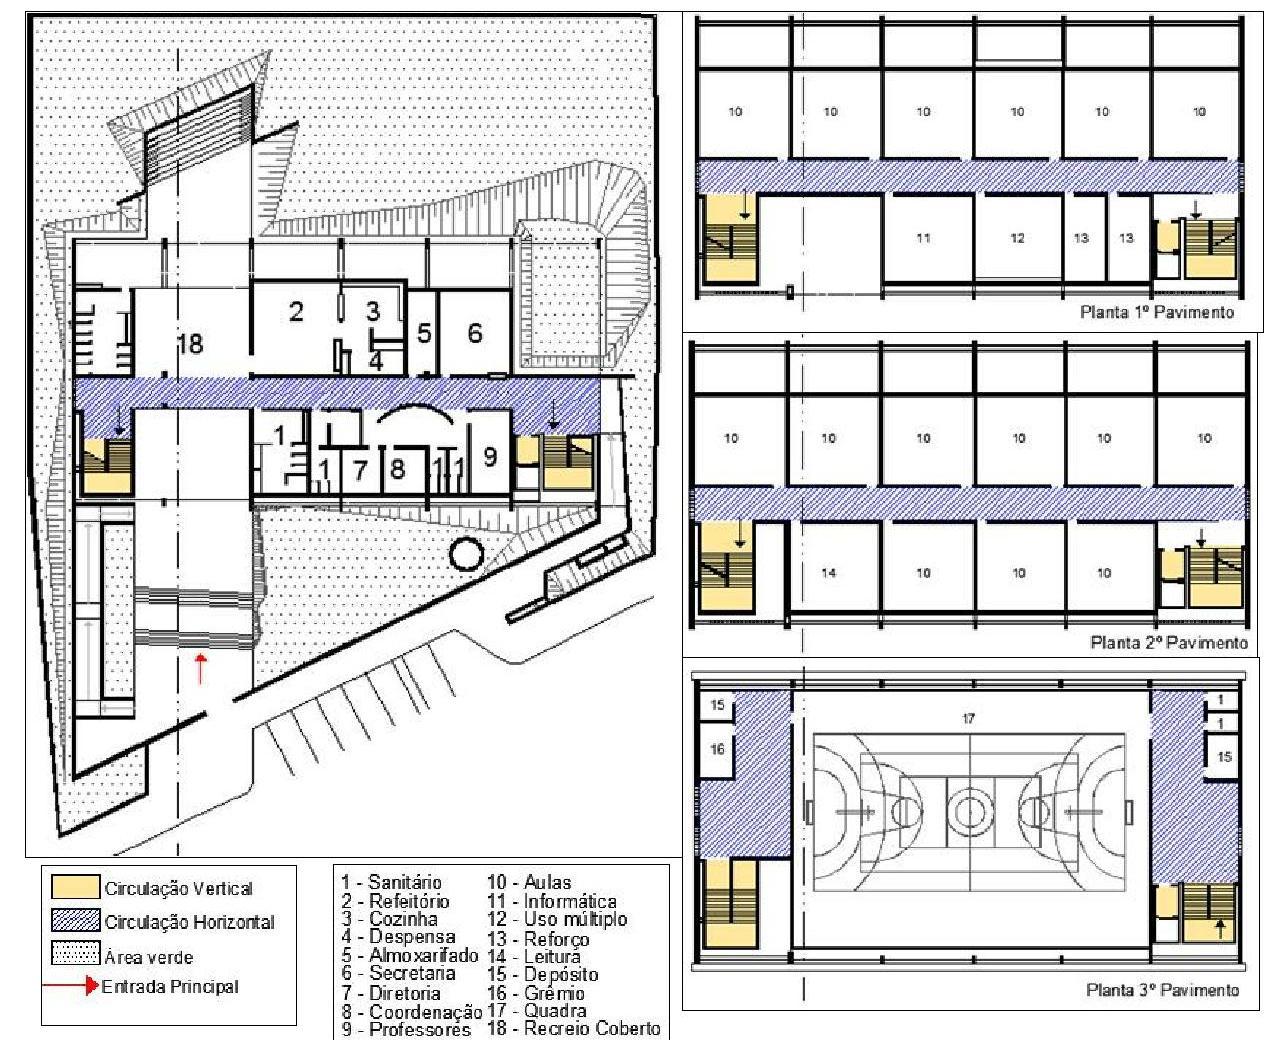 Arquitetura: Leitura de projeto FDE #AF931C 1280 1040